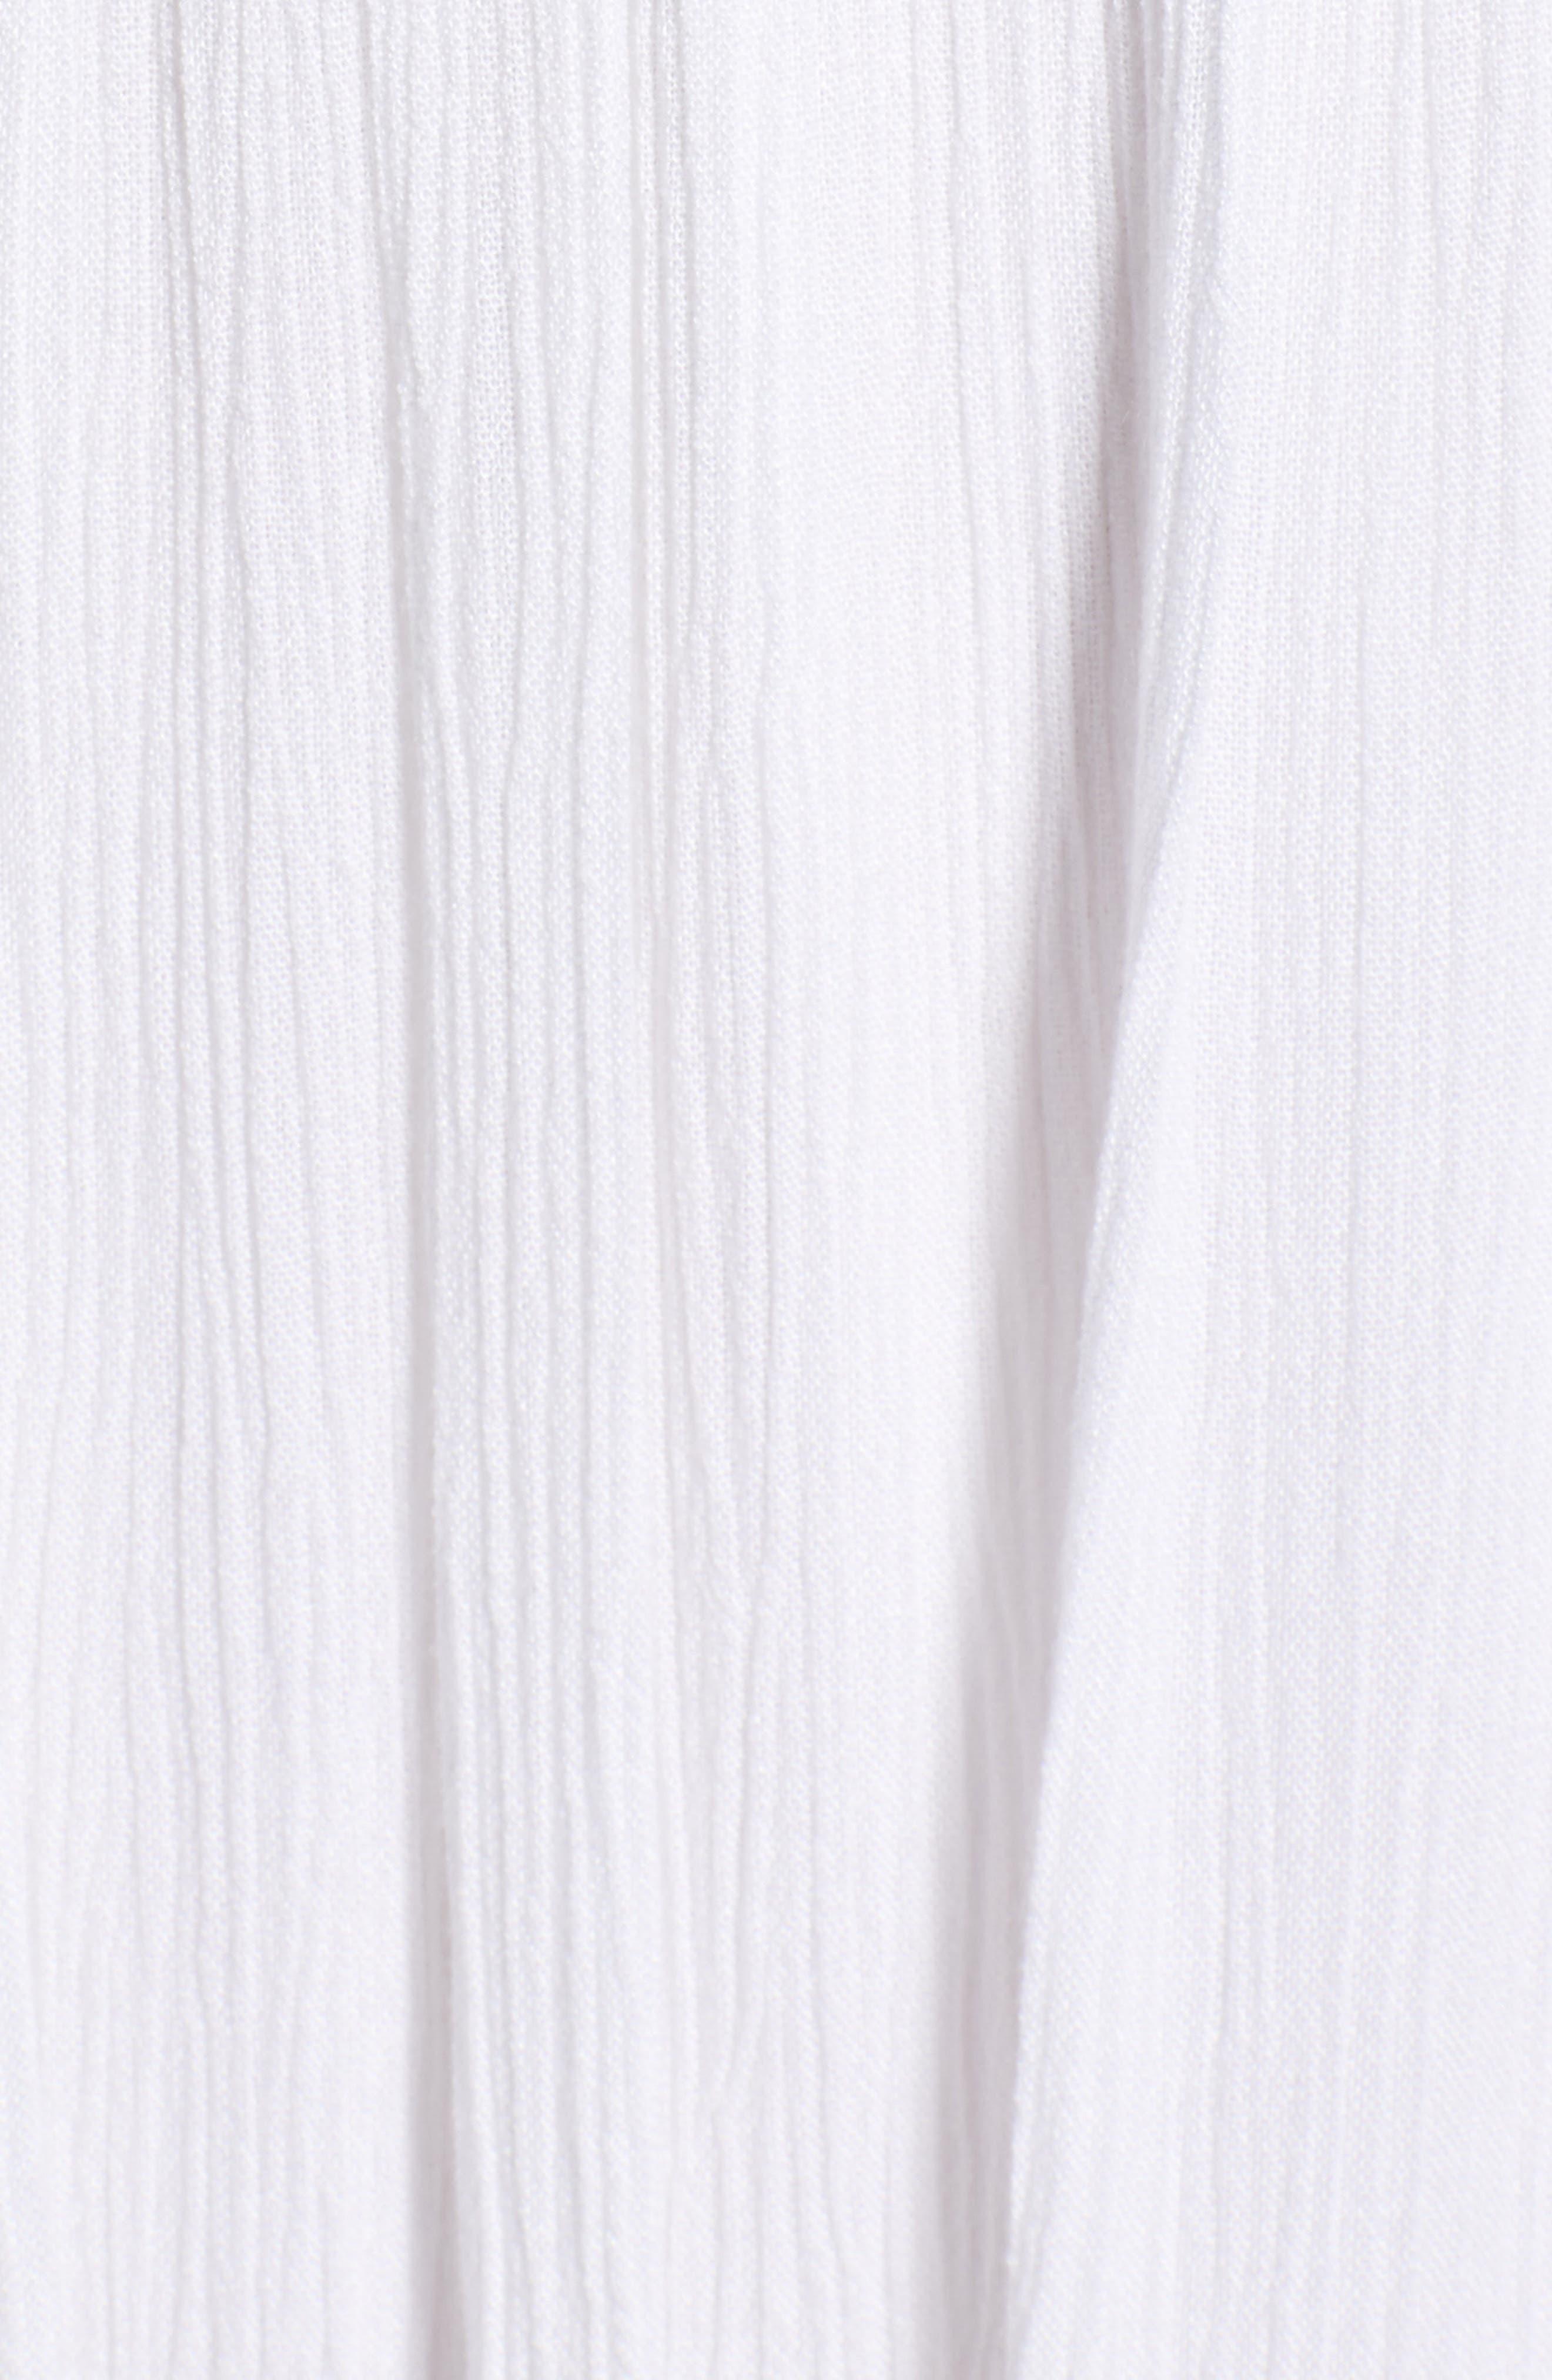 Bishop + Young Bora Bora Maxi Dress,                             Alternate thumbnail 6, color,                             White